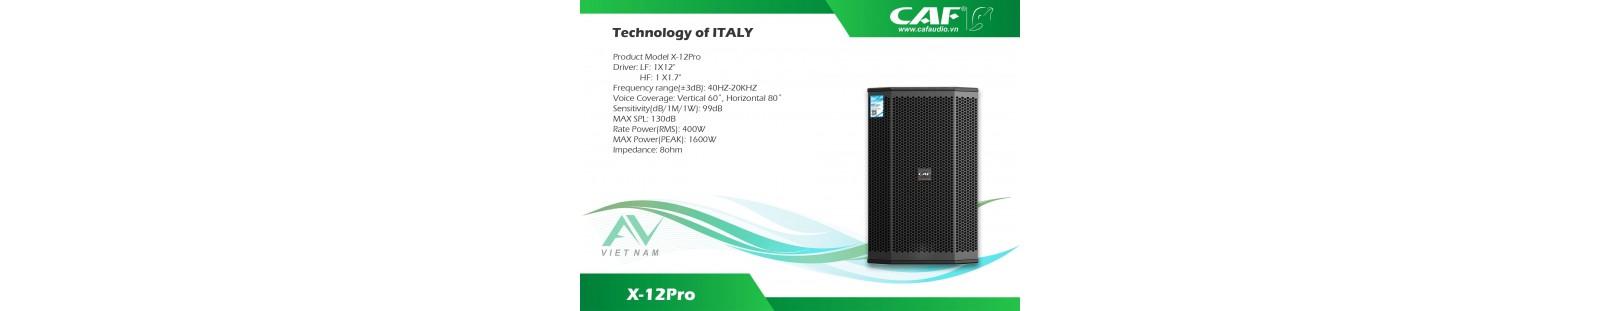 CAF X 12Pro